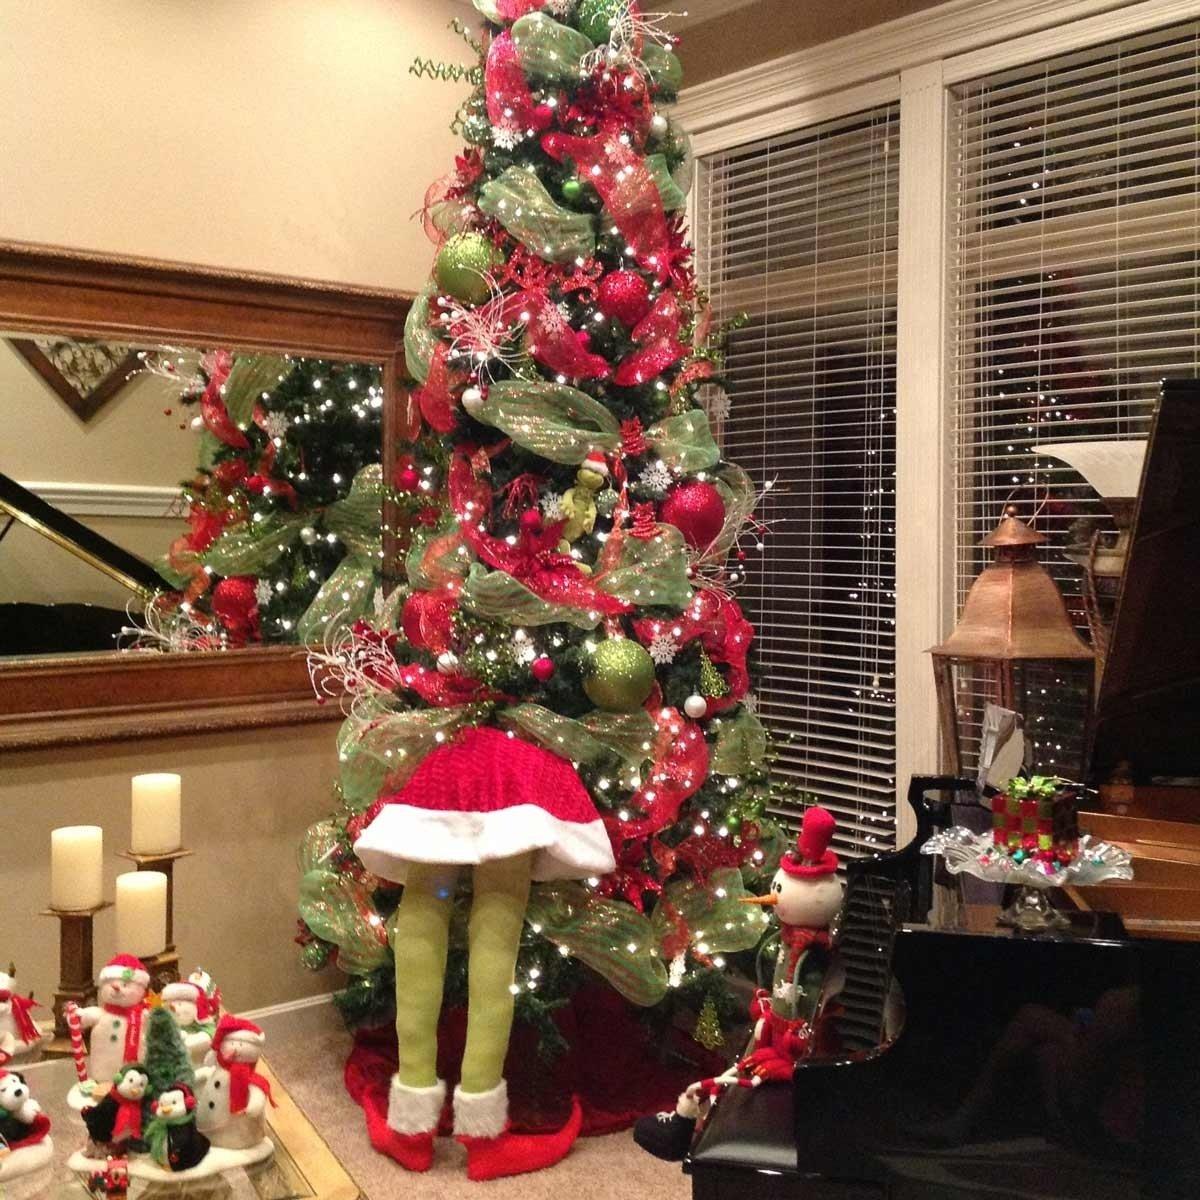 10 Stylish Christmas Tree Decorating Ideas Pictures 100 incredible christmas tree decorating ideas family handyman 2